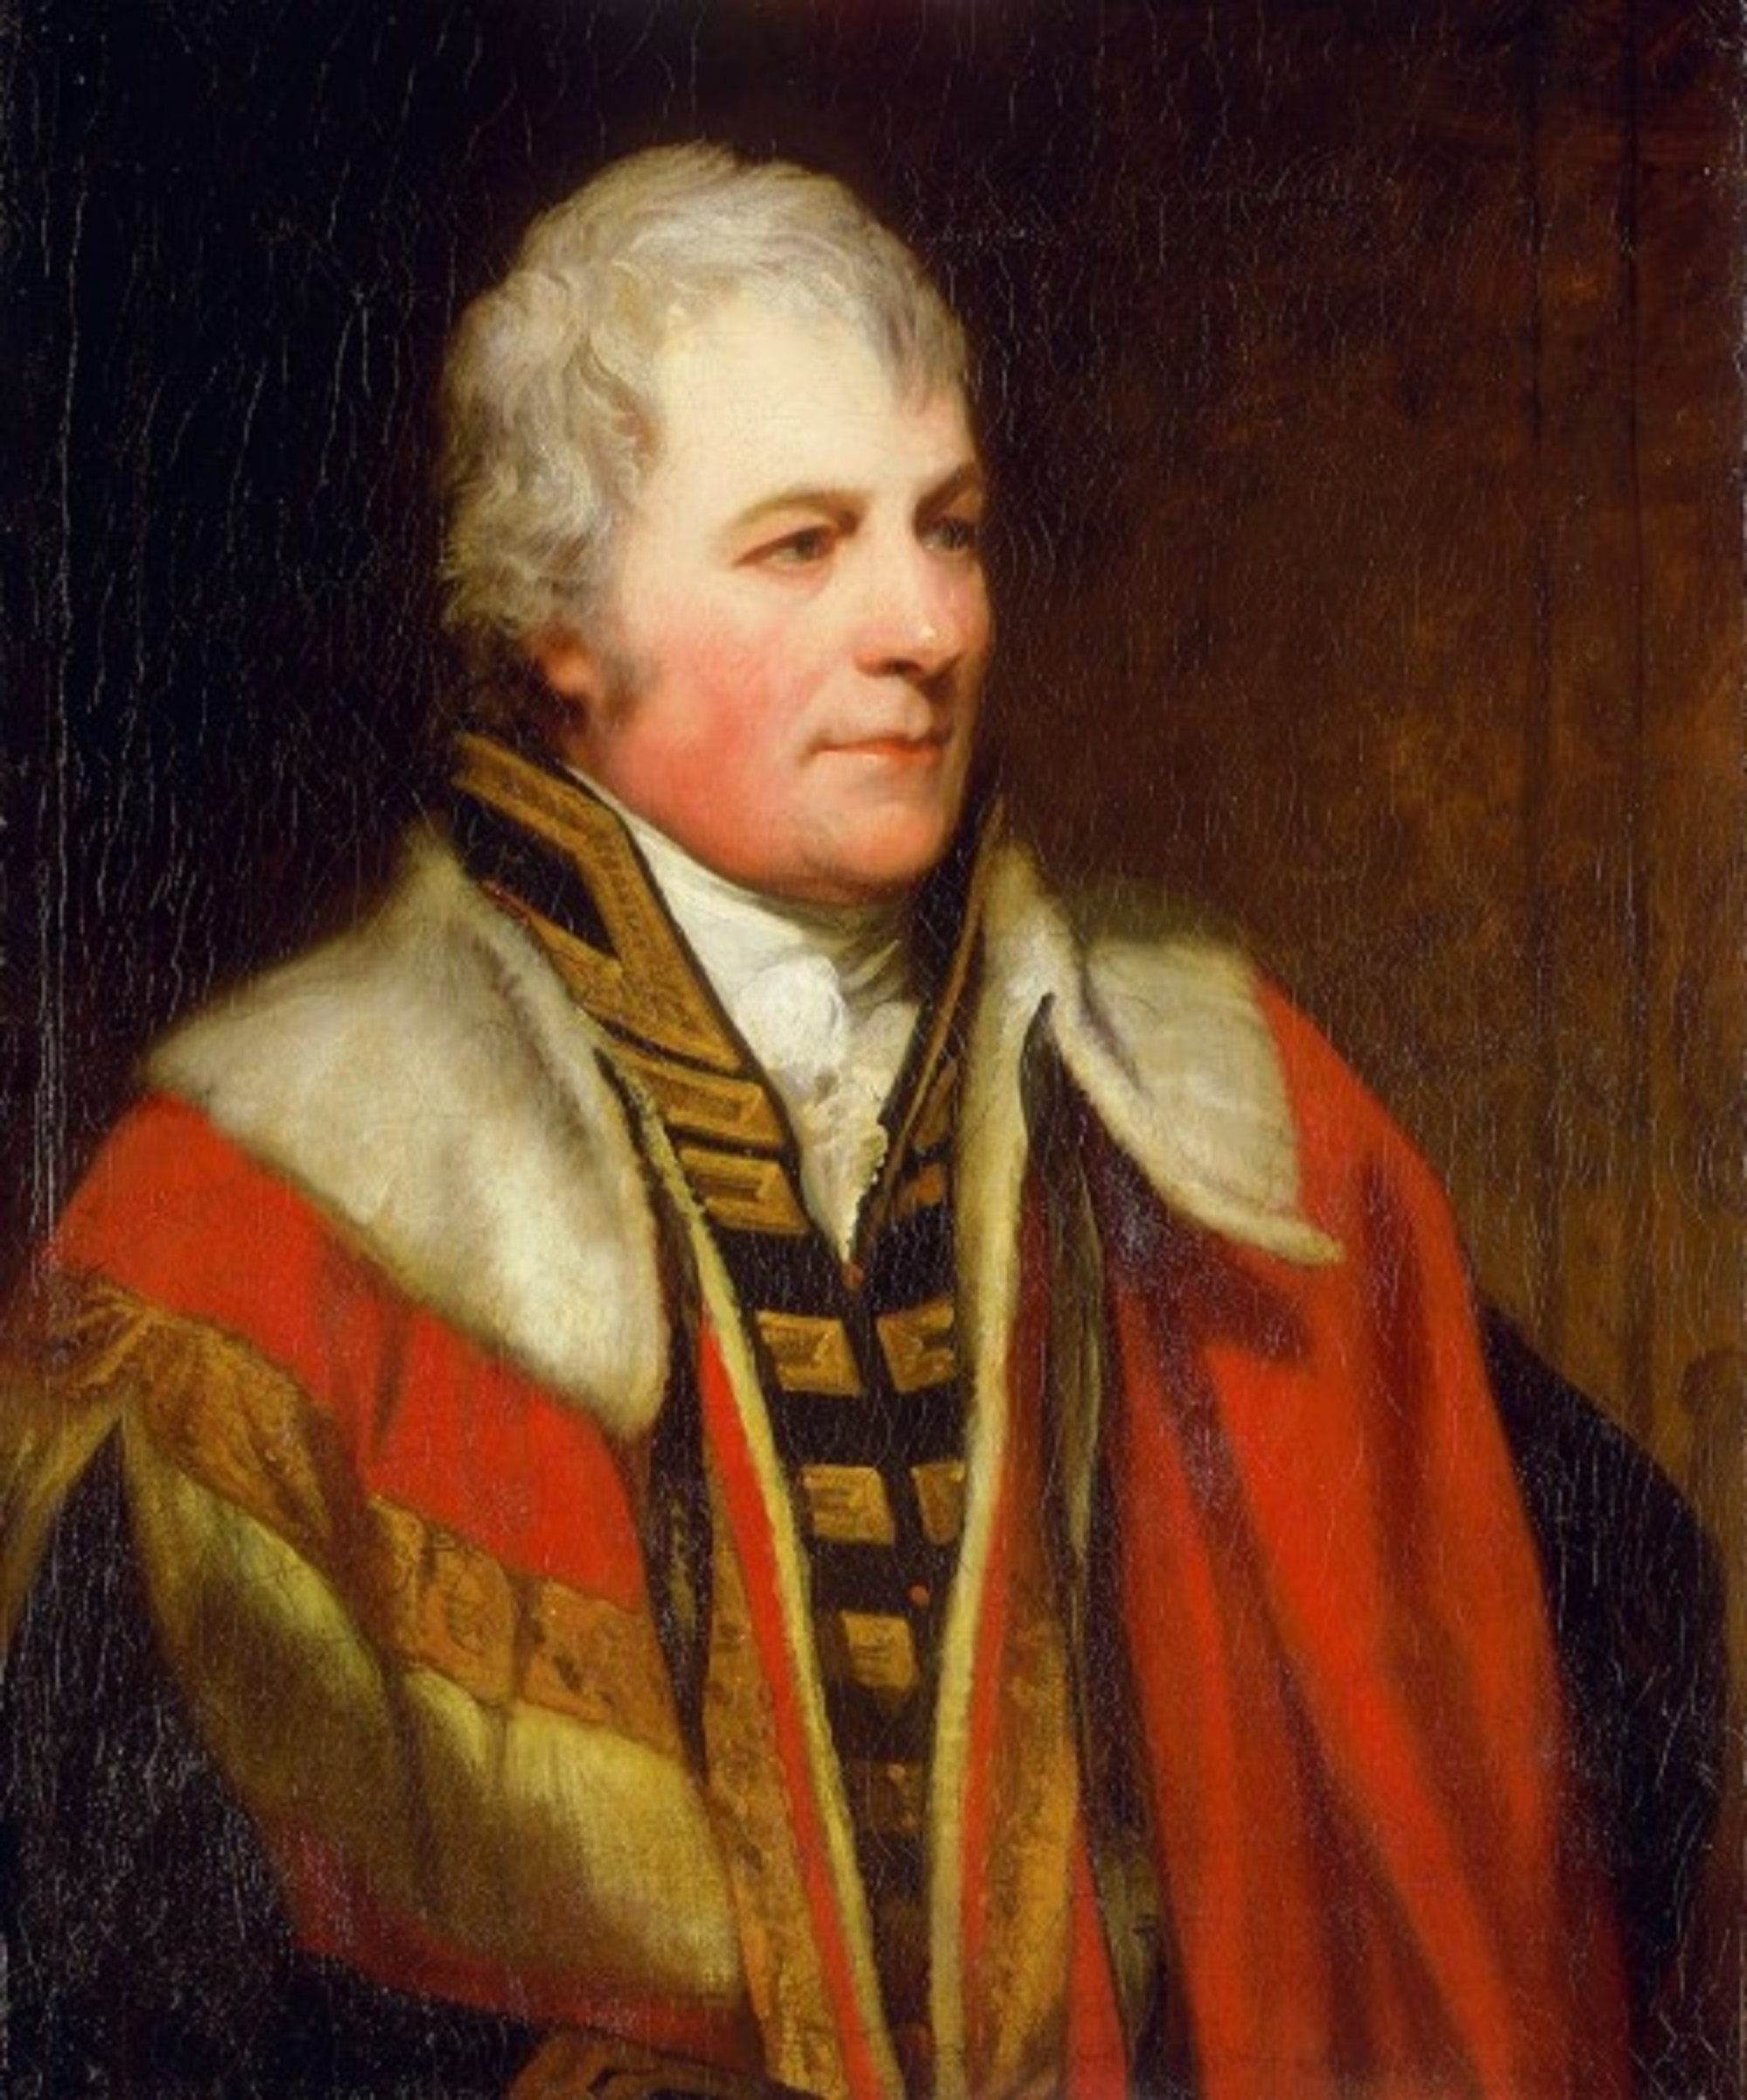 William-Carnegie-1756-1831-7th-Earl-of-Northesk-RMG-BHC4224.jpg